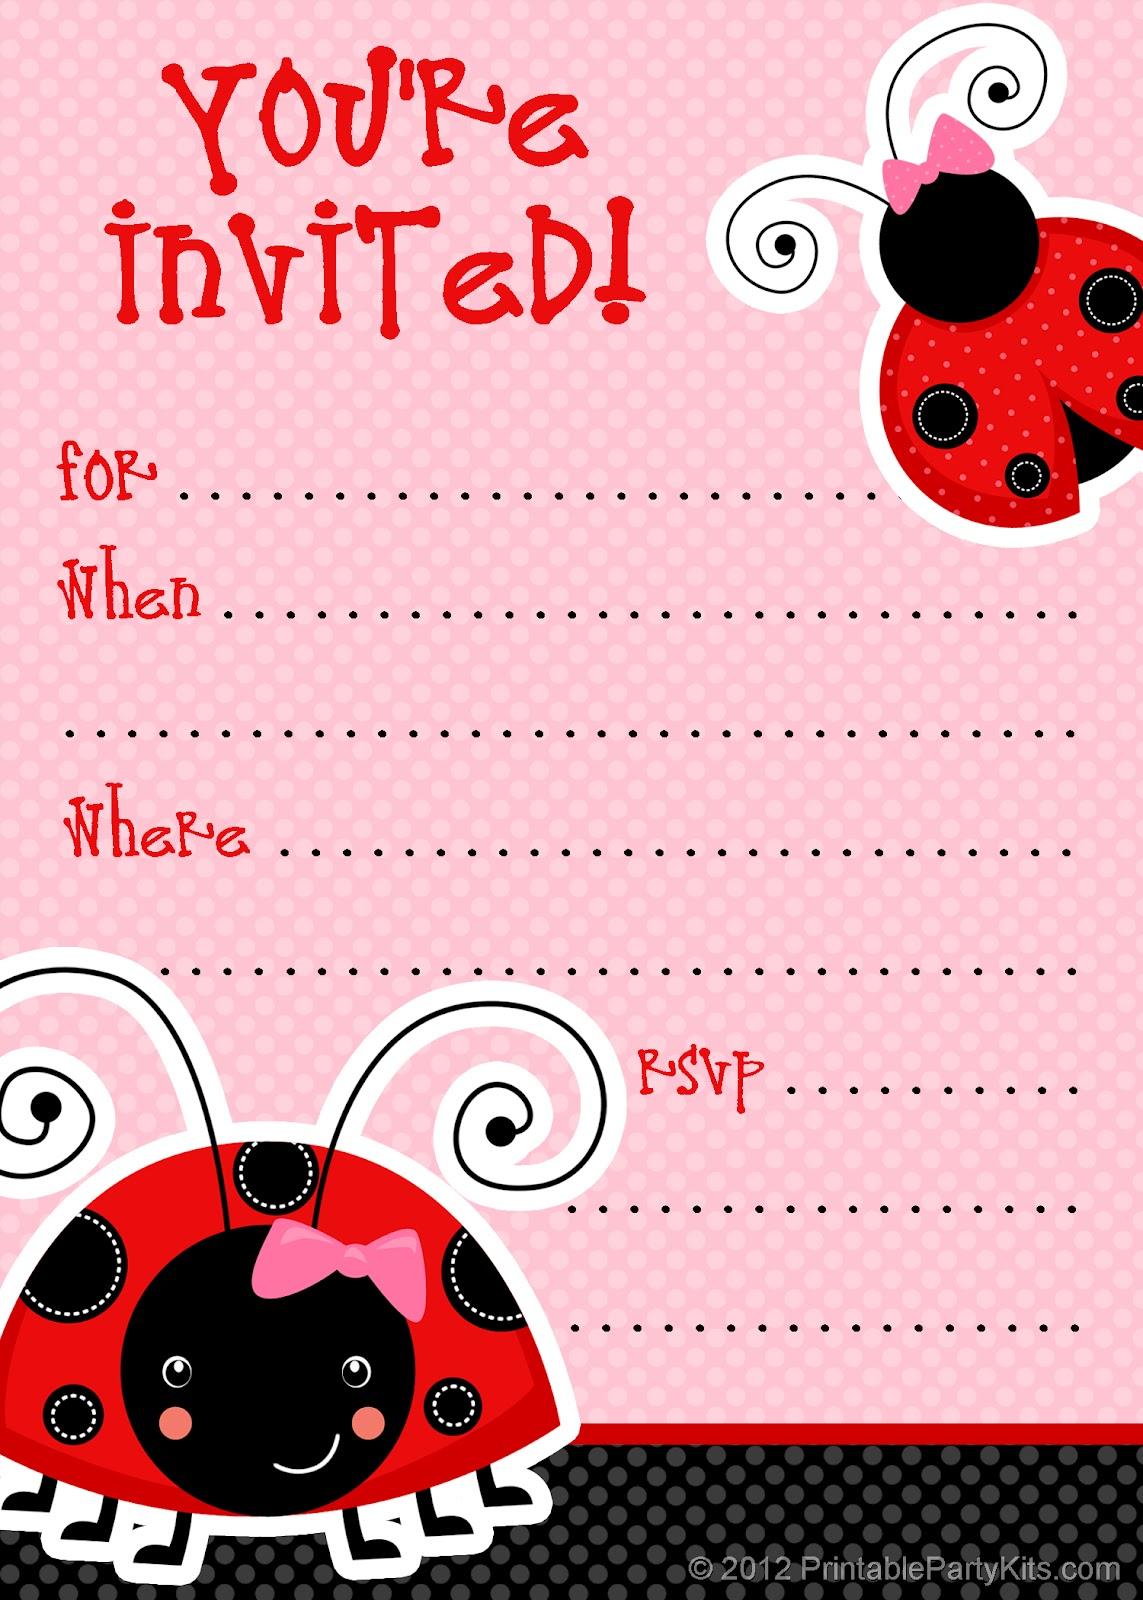 Free Printable Party Invitations Free Ladybug Invite Template